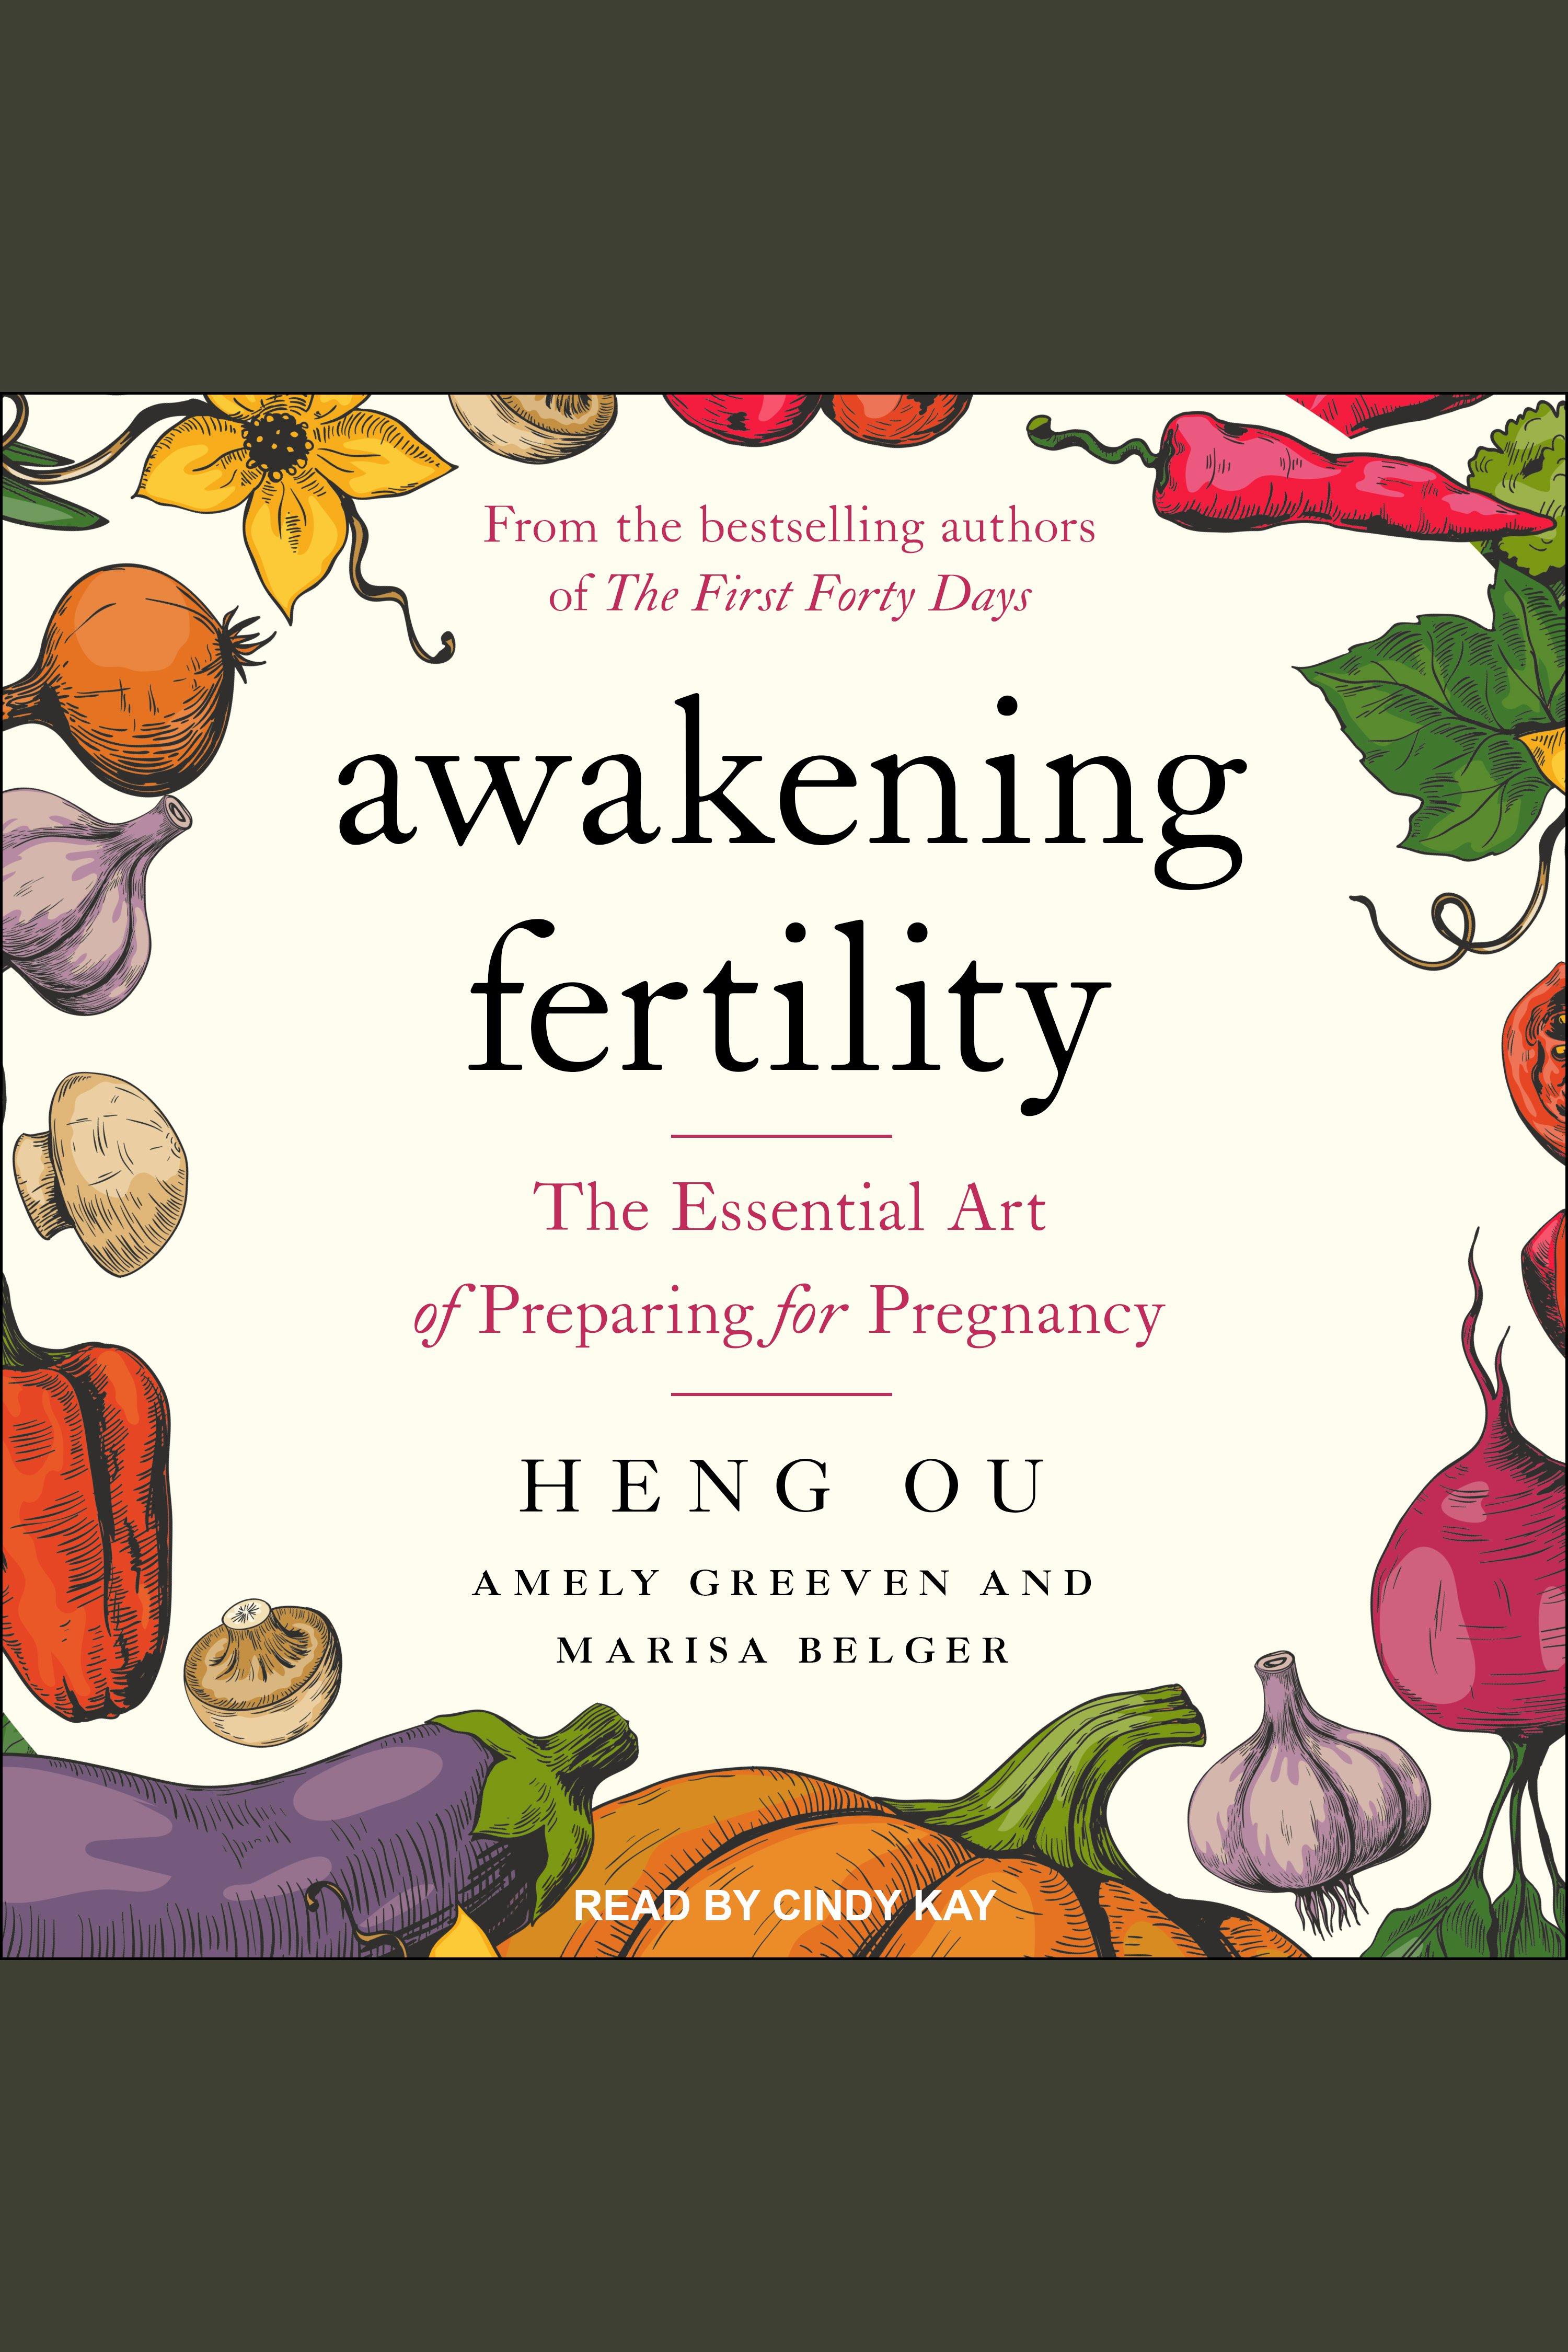 Awakening Fertility The Essential Art of Preparing for Pregnancy